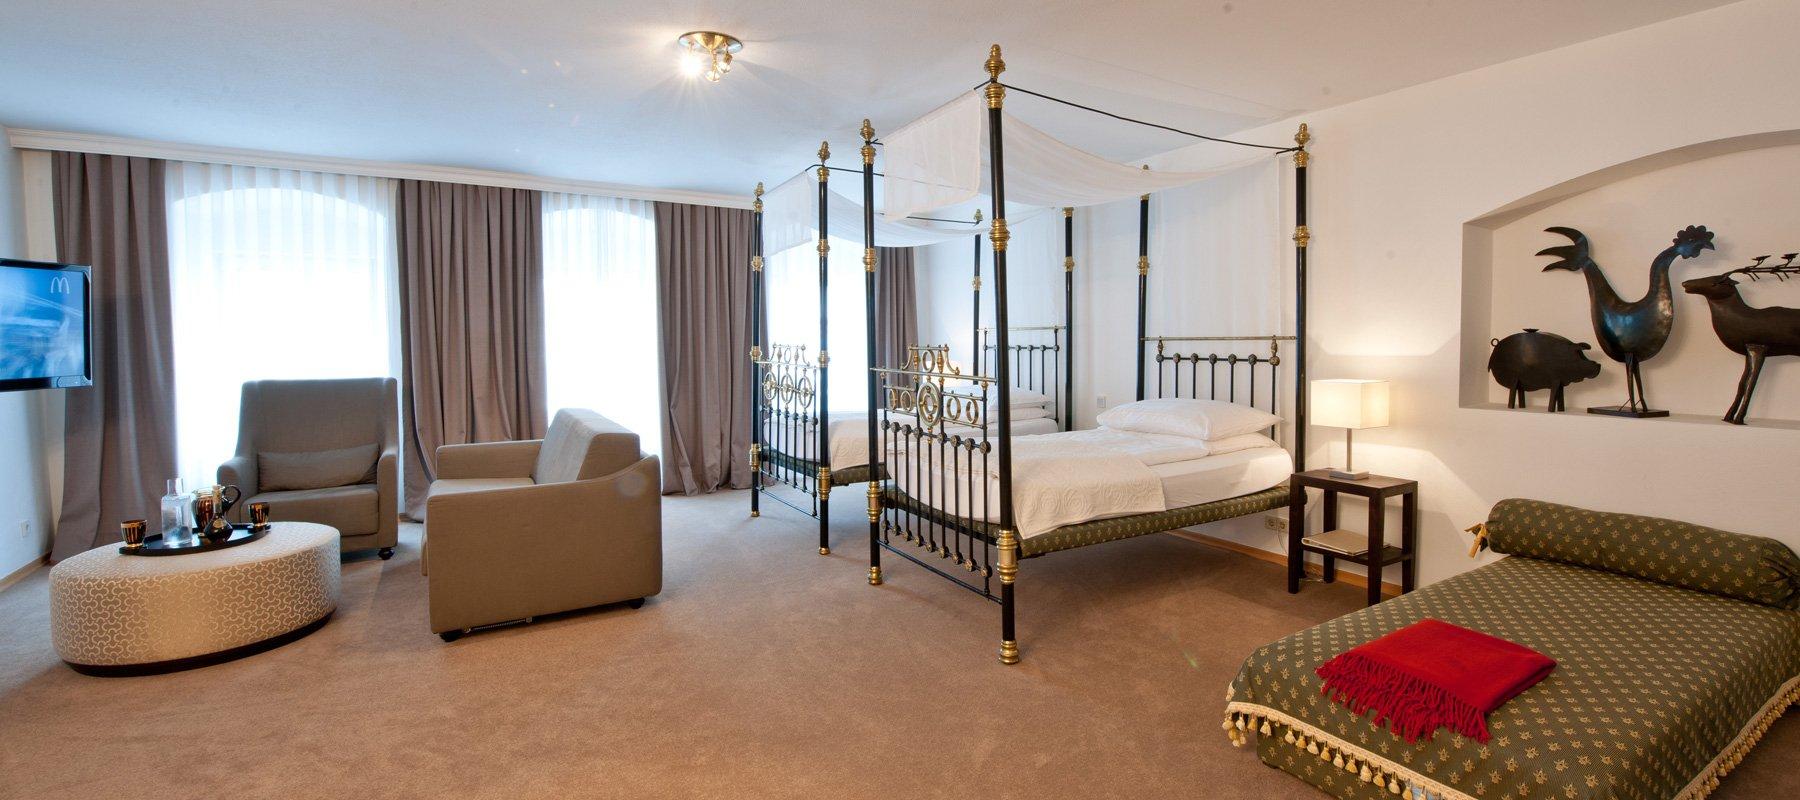 Hotel Forstinger Suite